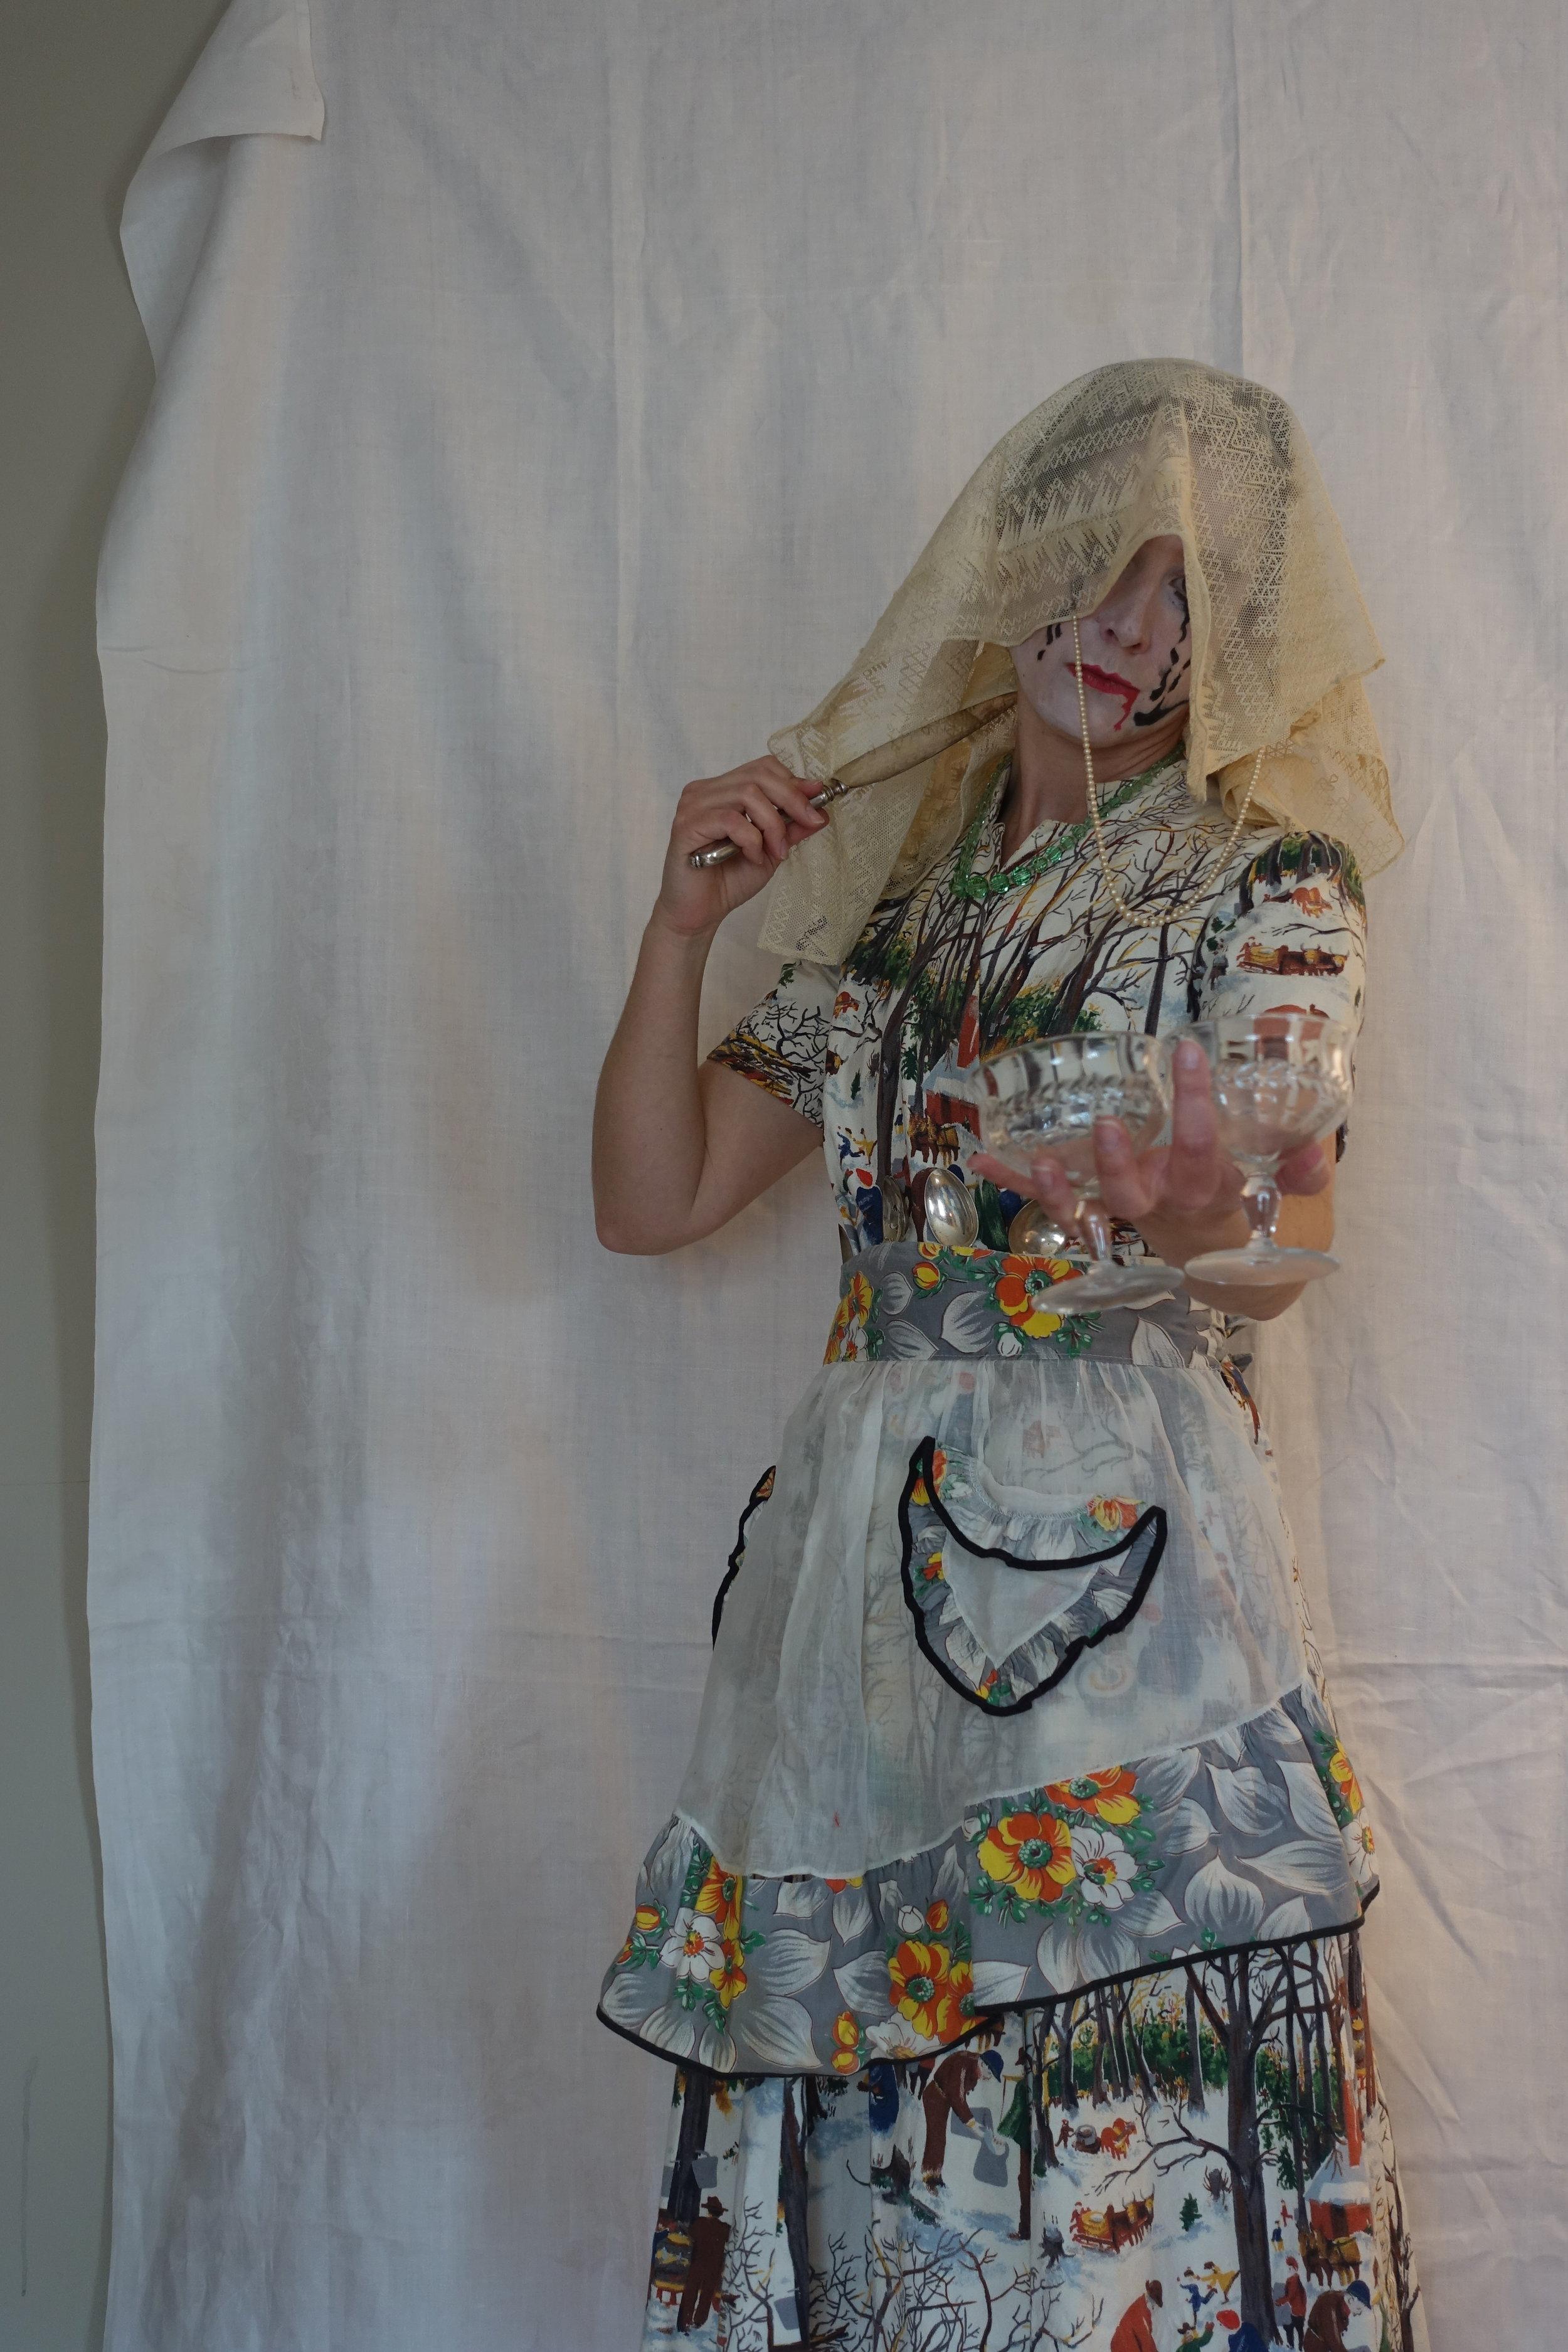 - #libbywomen: occupation housewife